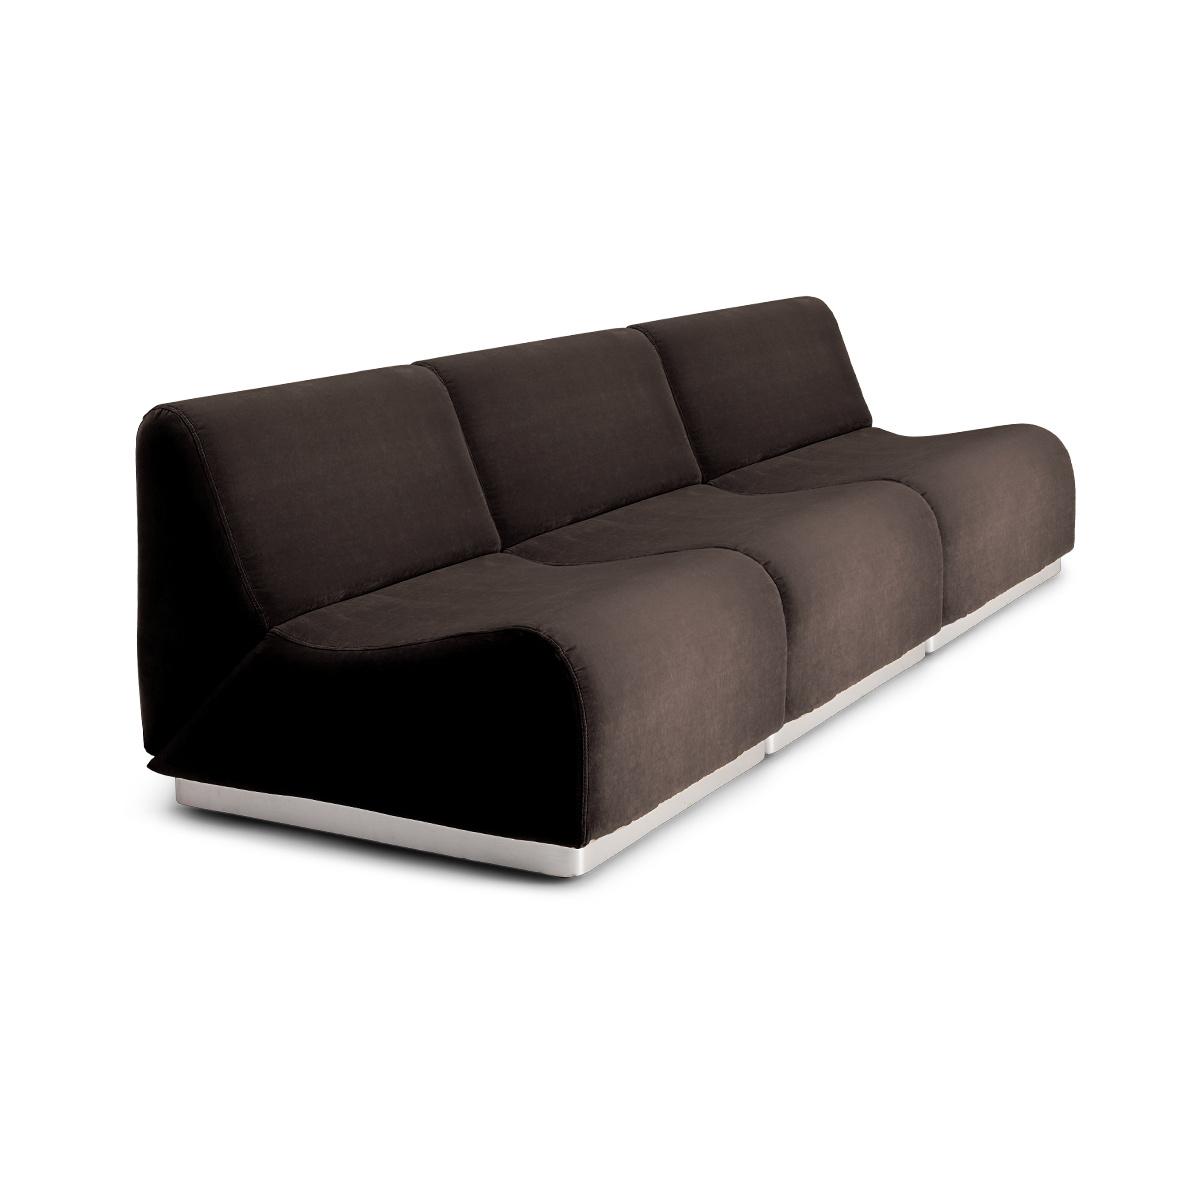 Rotondo Modular Sofa in Taupe Velvet